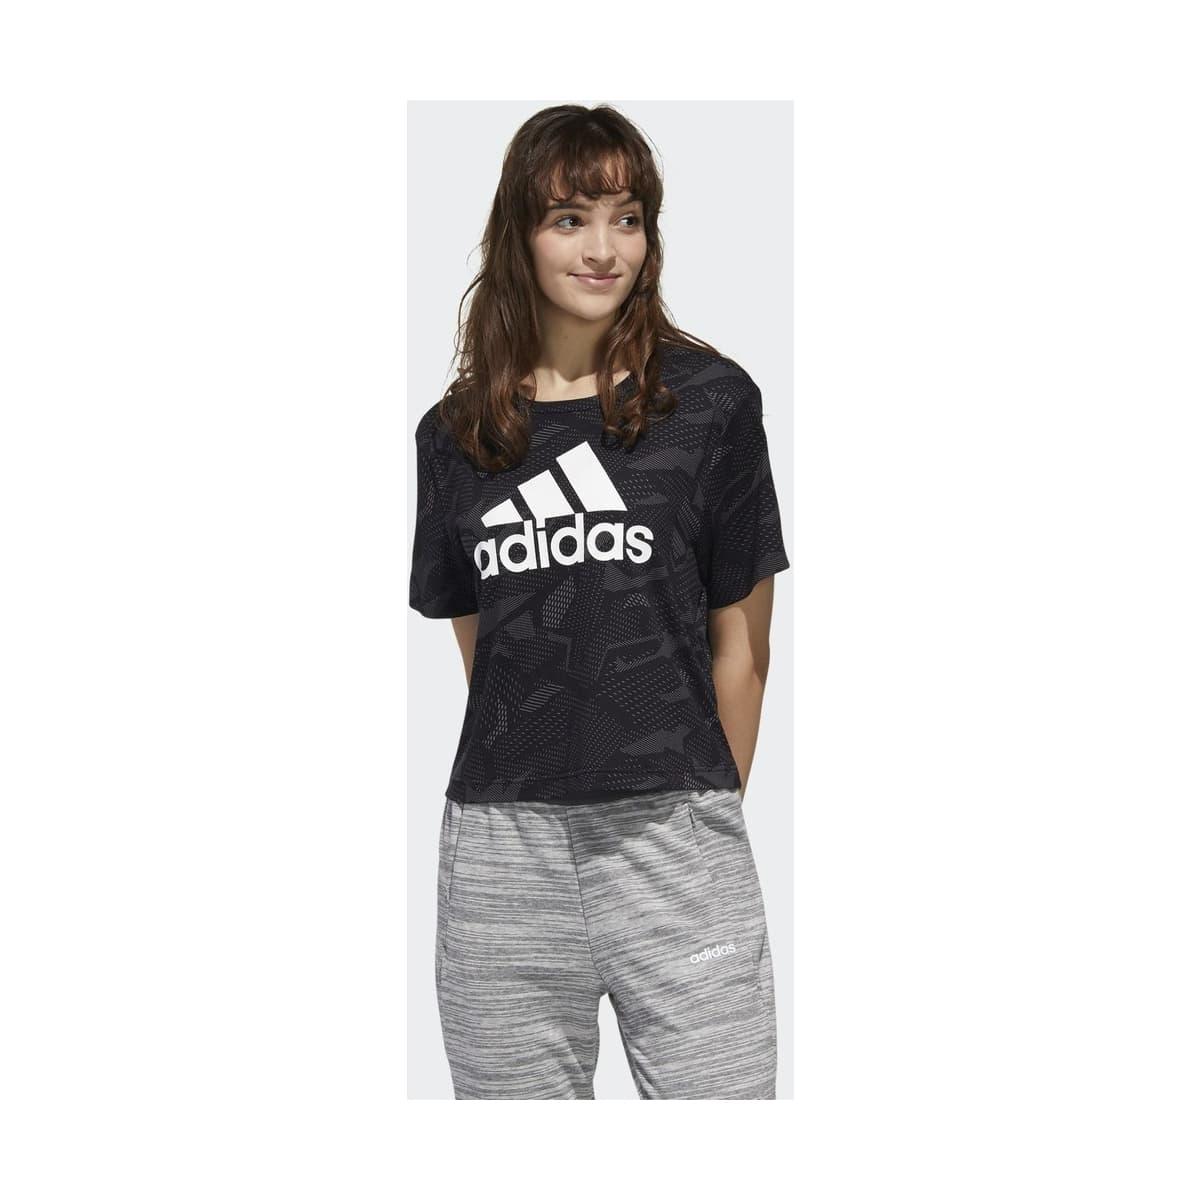 Essentials Allover Print Kadın Siyah Tişört (GE1137)